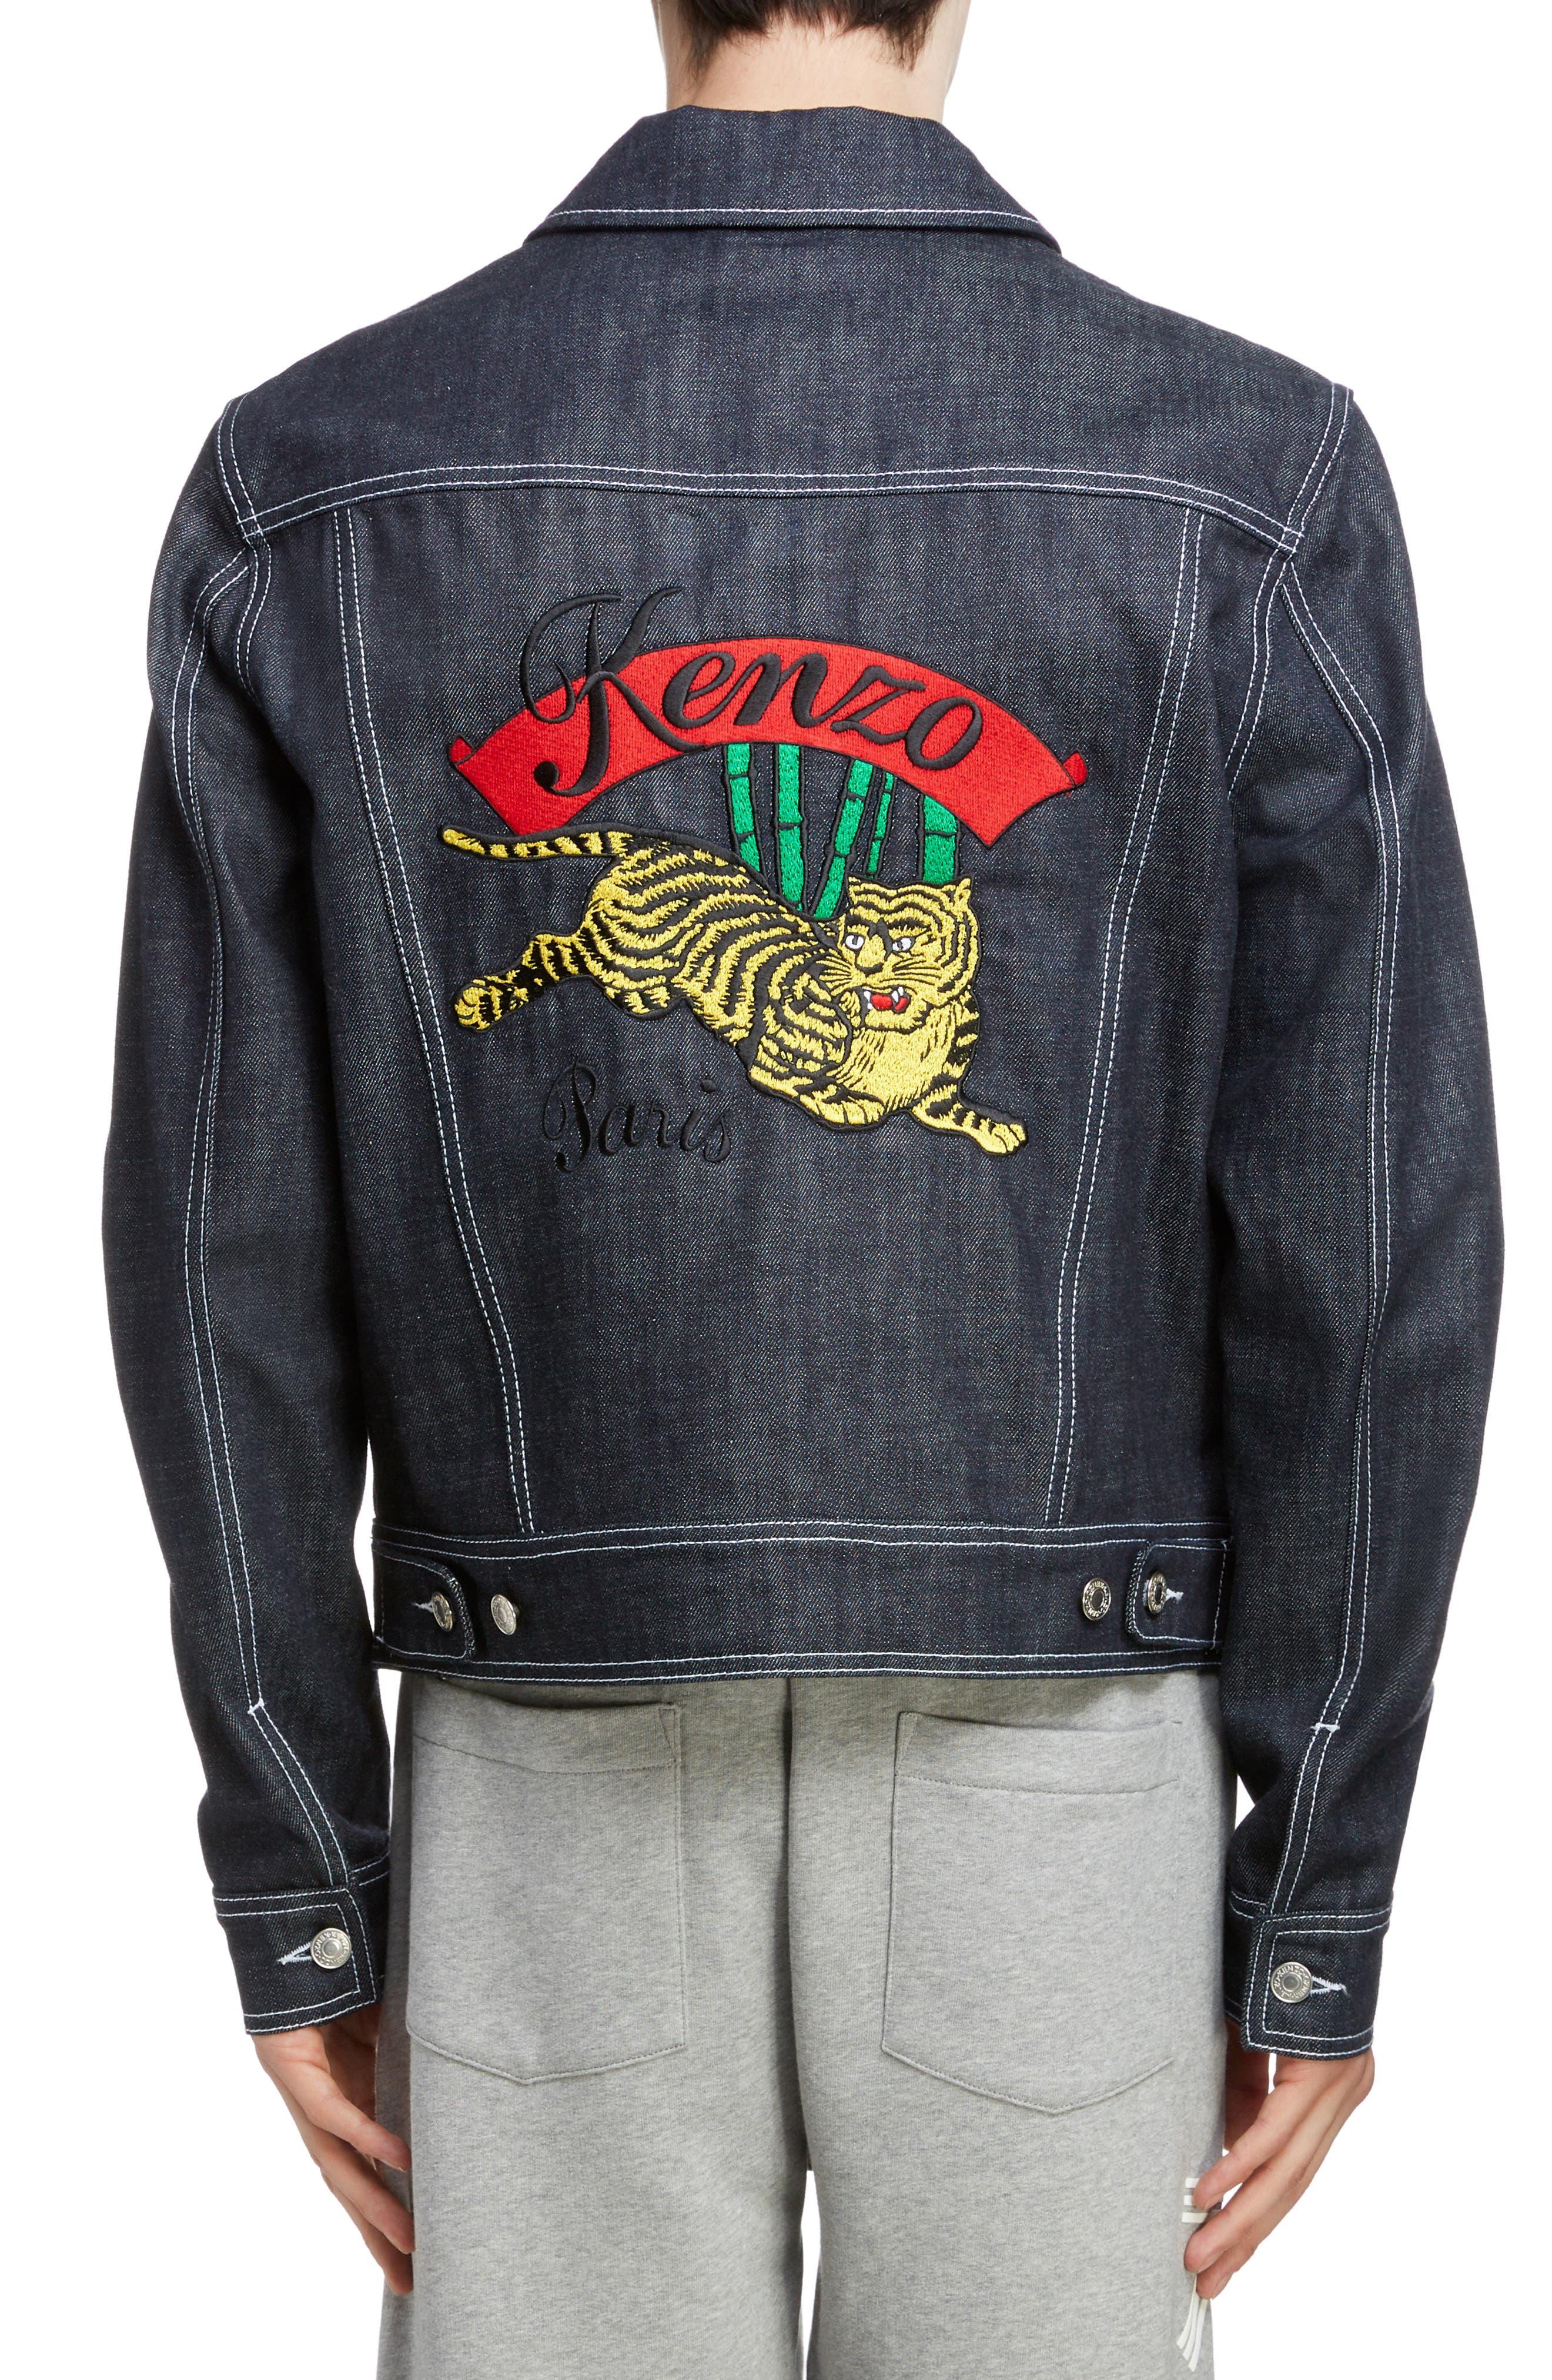 KENZO, Jumping Tiger Embroidered Denim Jacket, Alternate thumbnail 2, color, NAVY BLUE